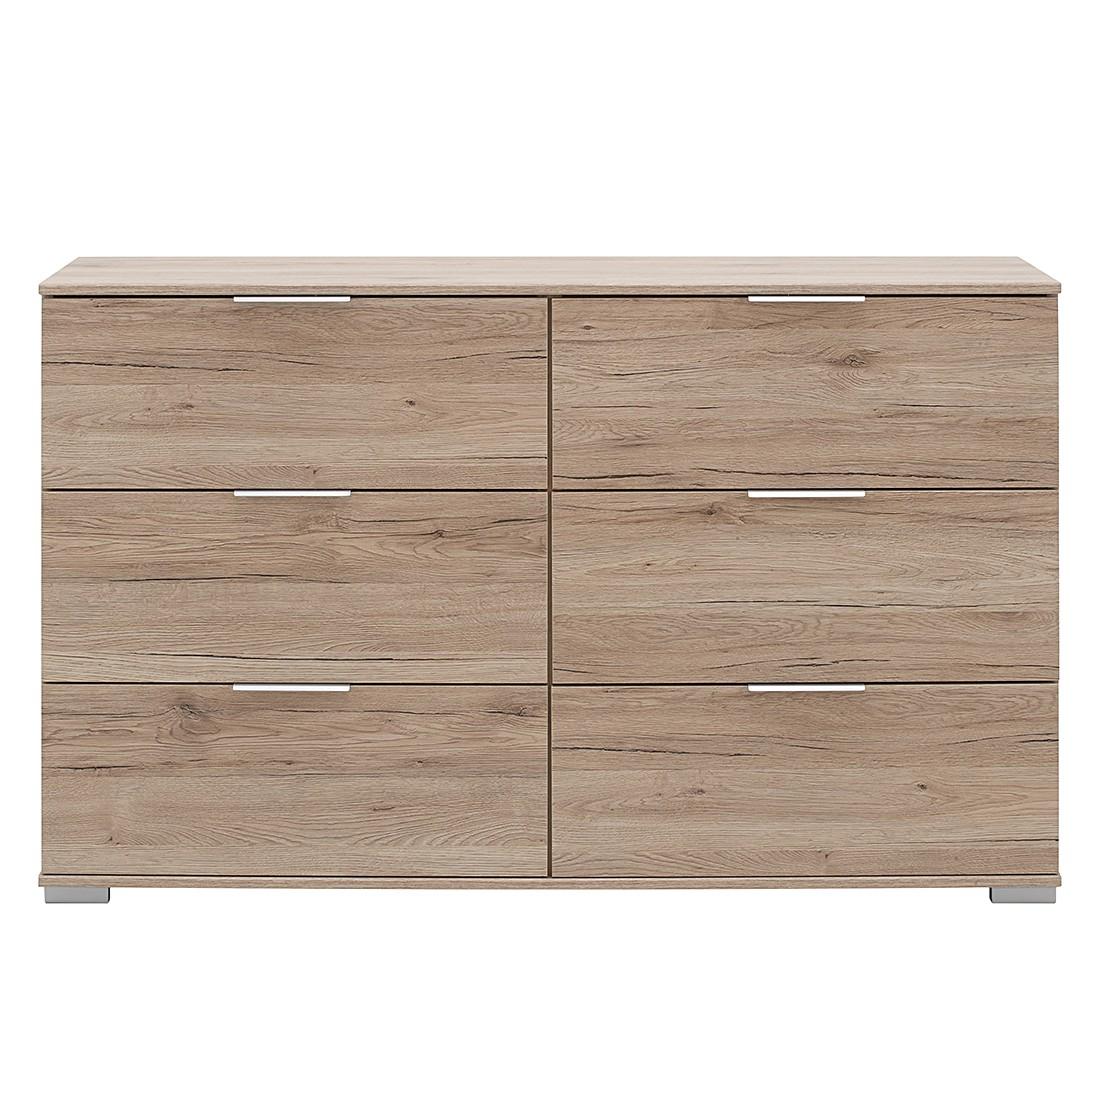 Commode à tiroirs Easy Plus III - Imitation chêne de Sanremo - Imitation chêne de Sanremo, Wimex